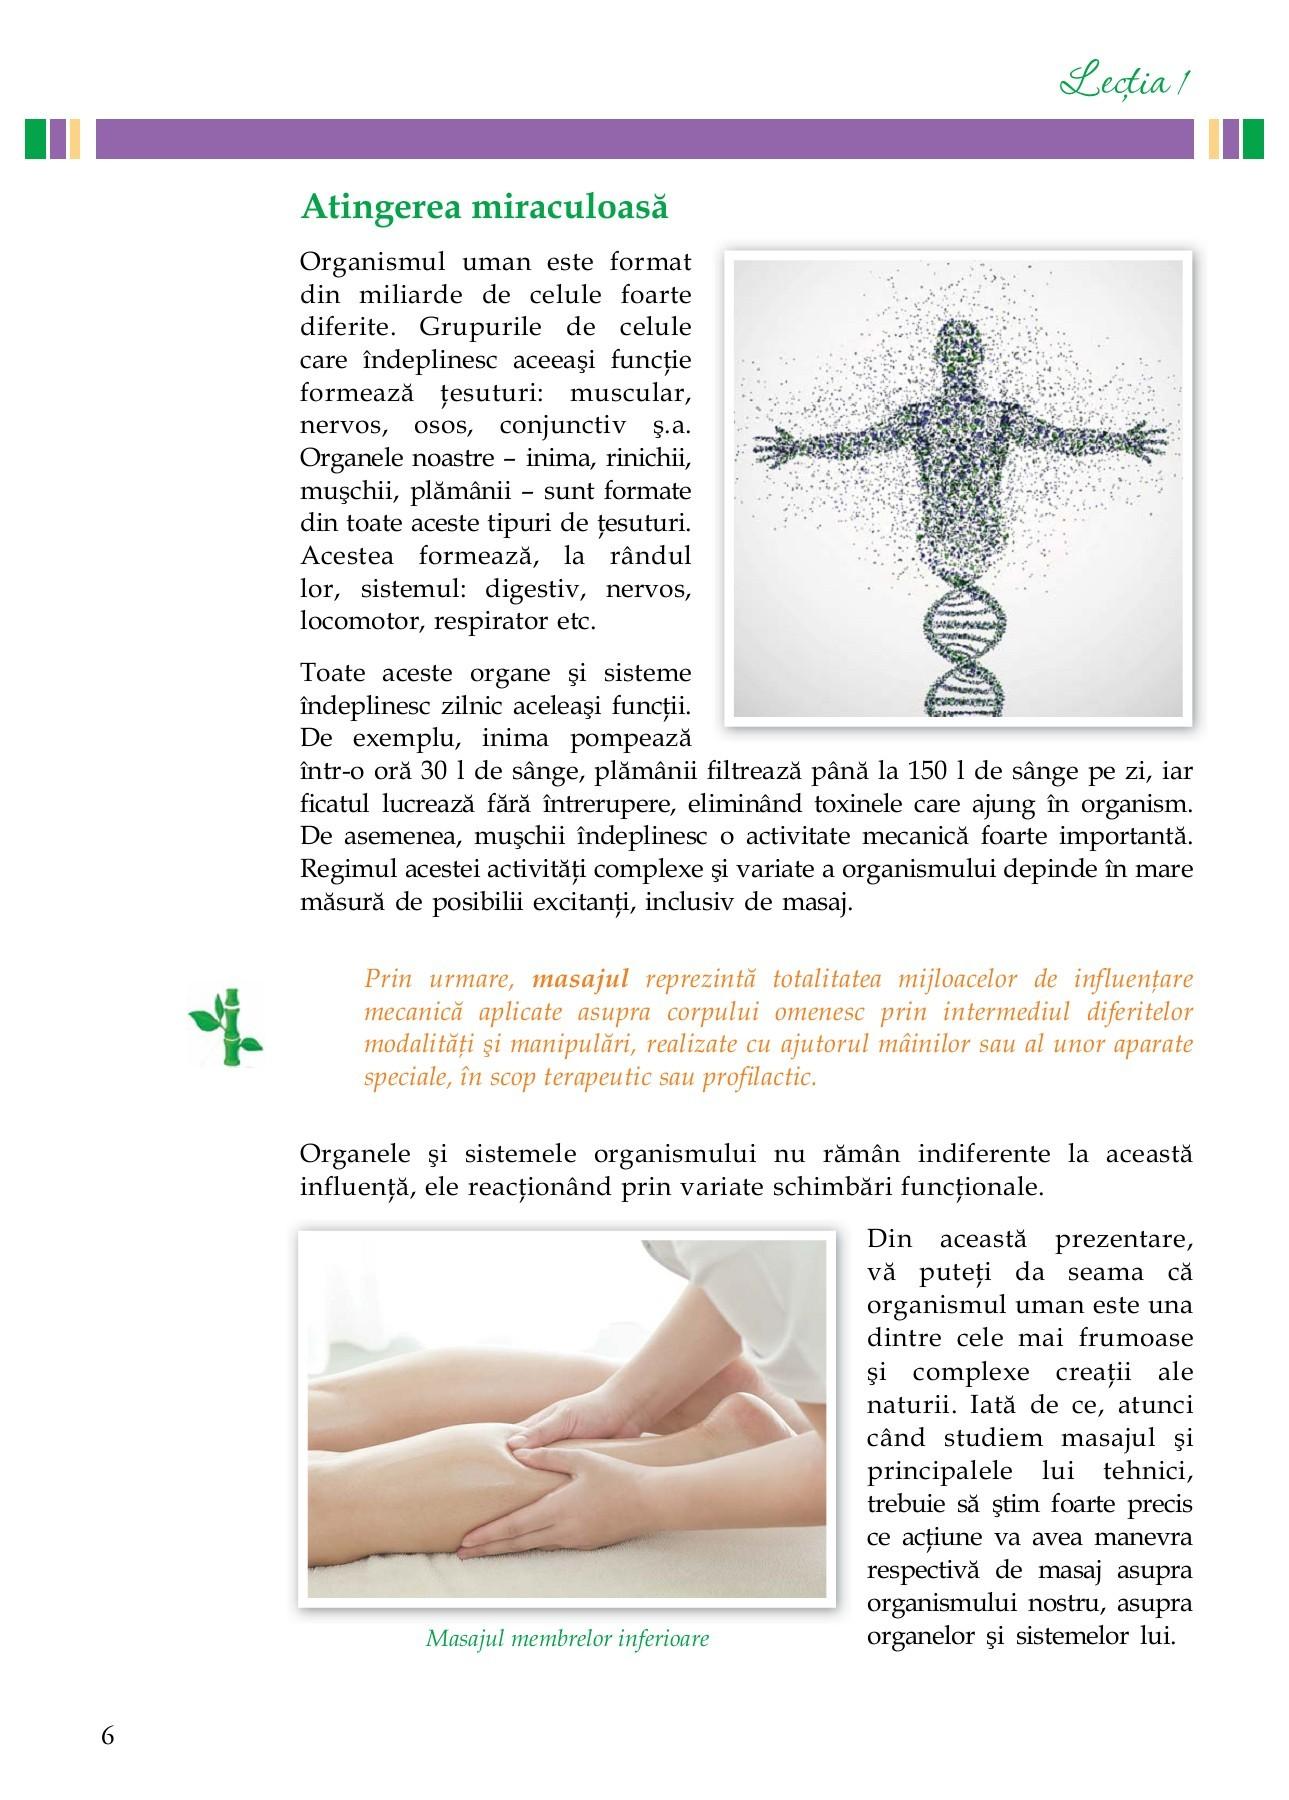 organe toxine